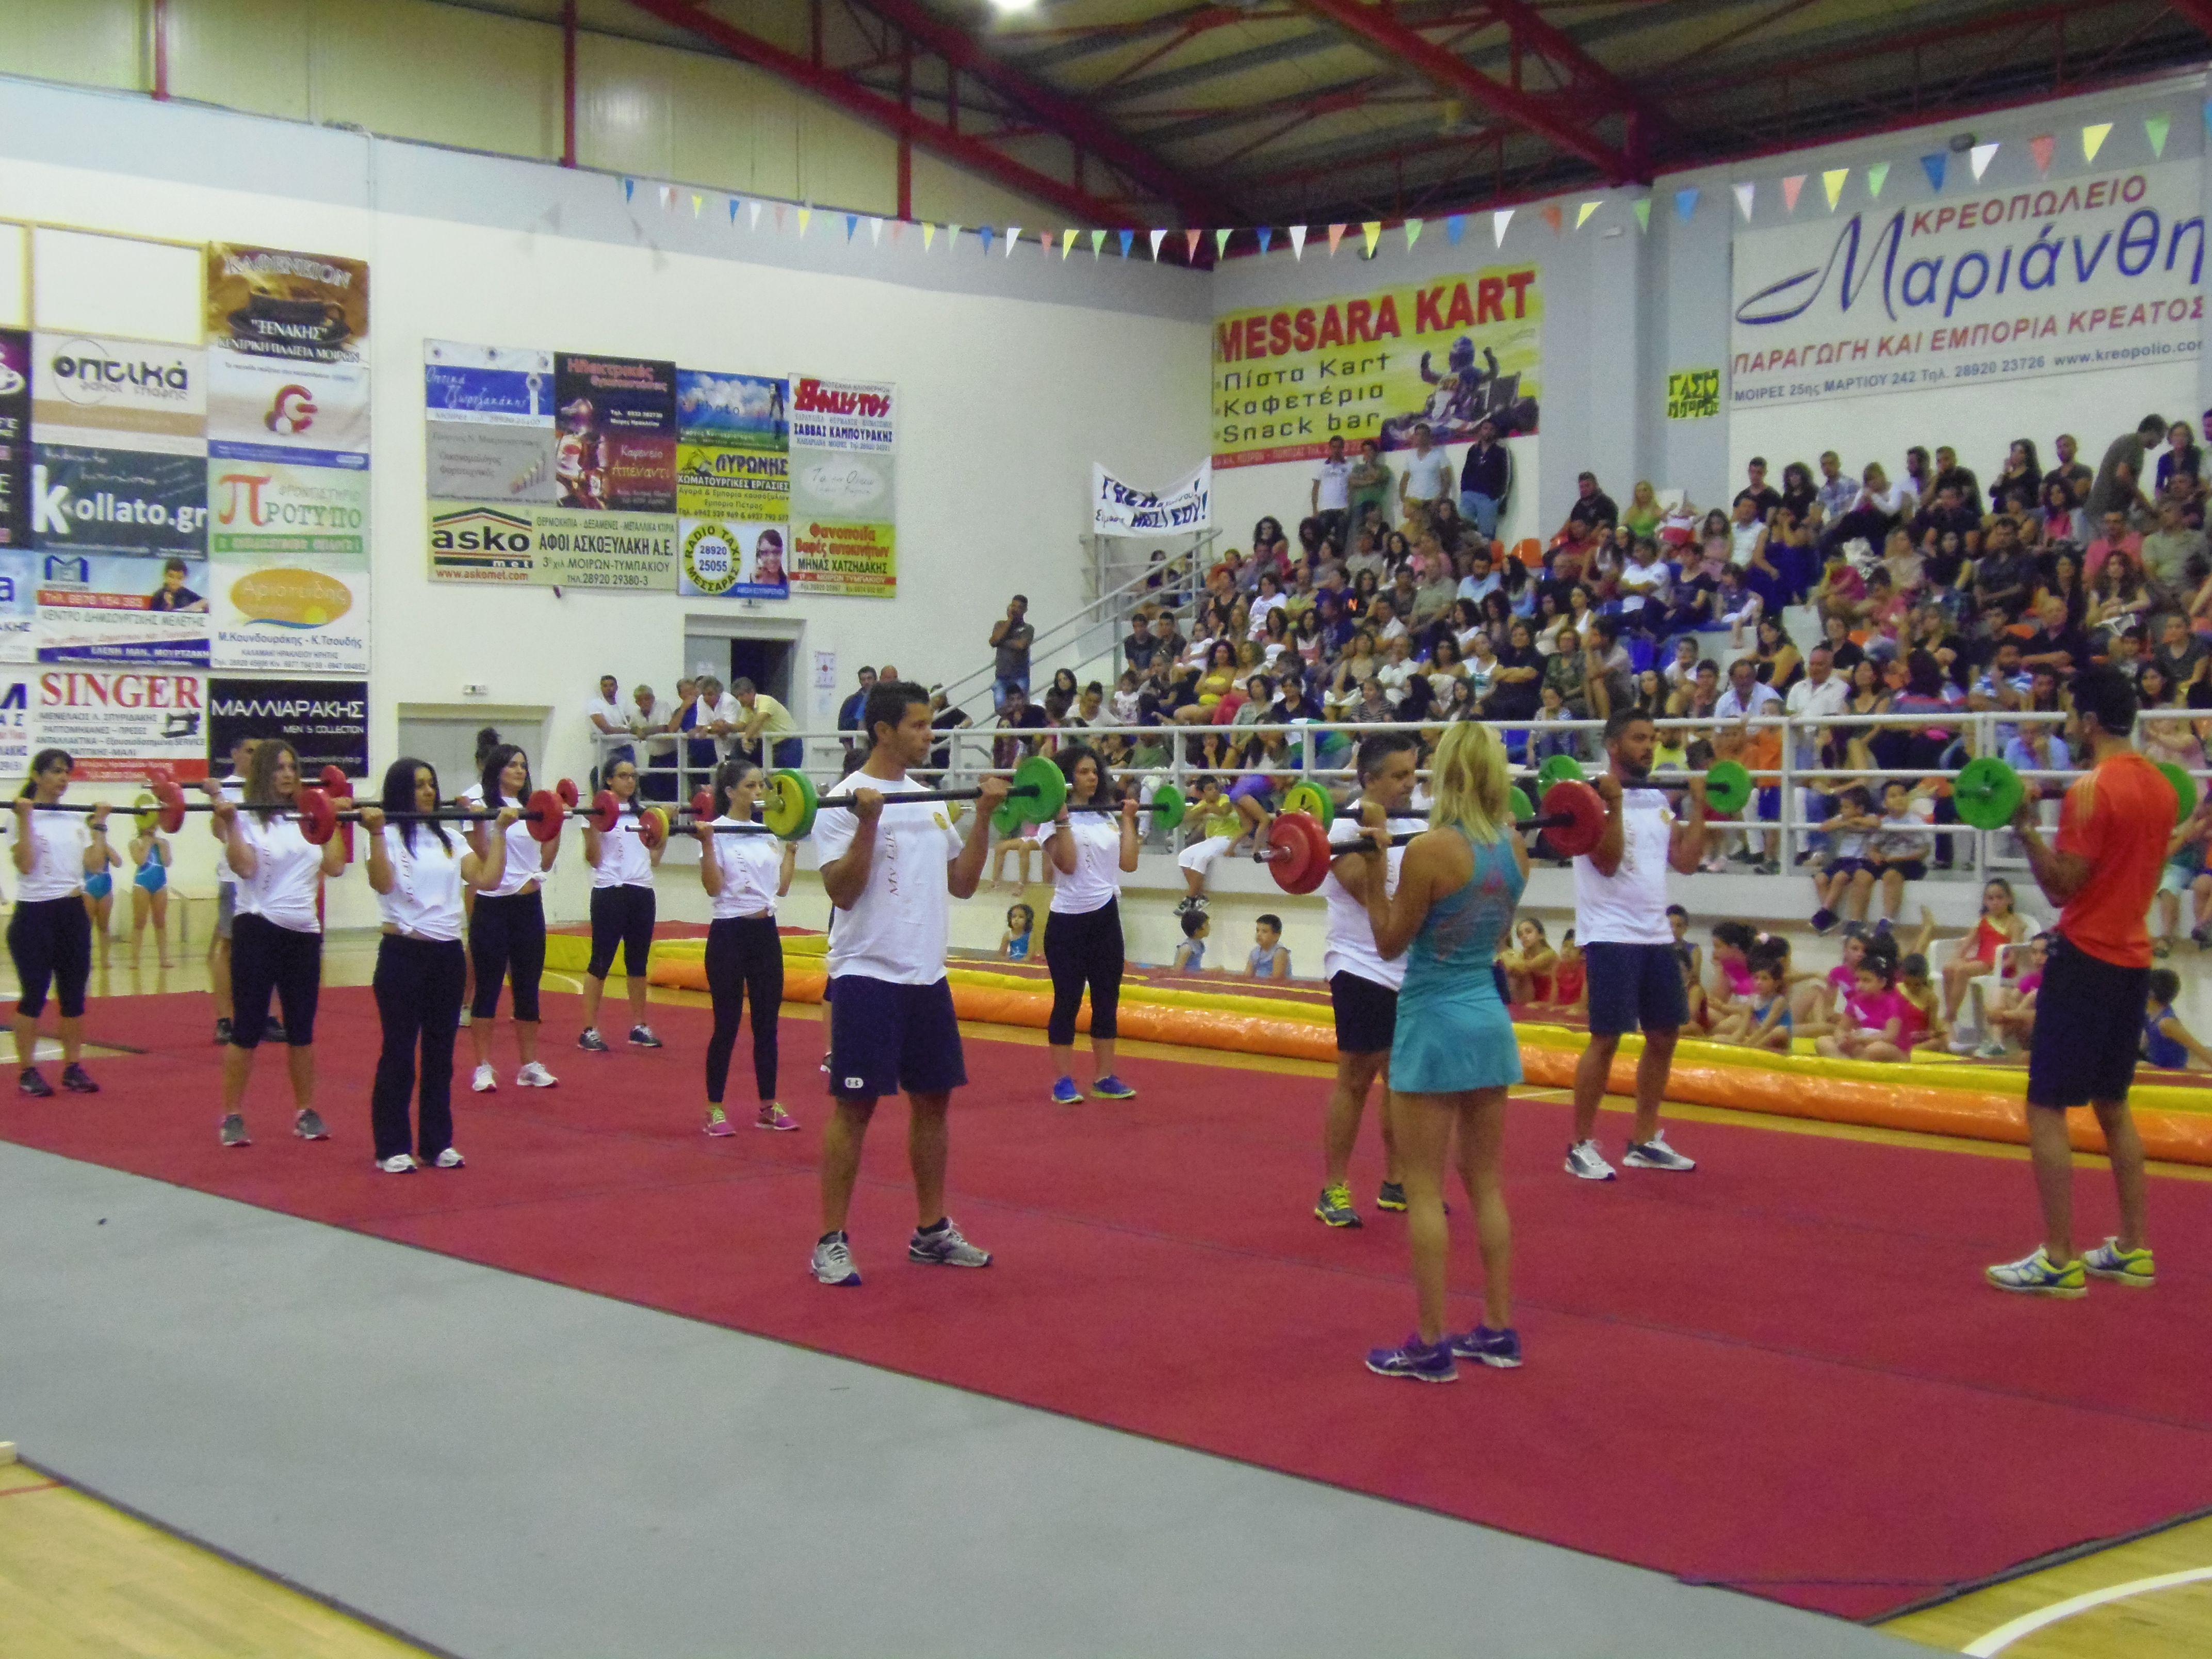 Gym show bodypump june 30 2012 body pump